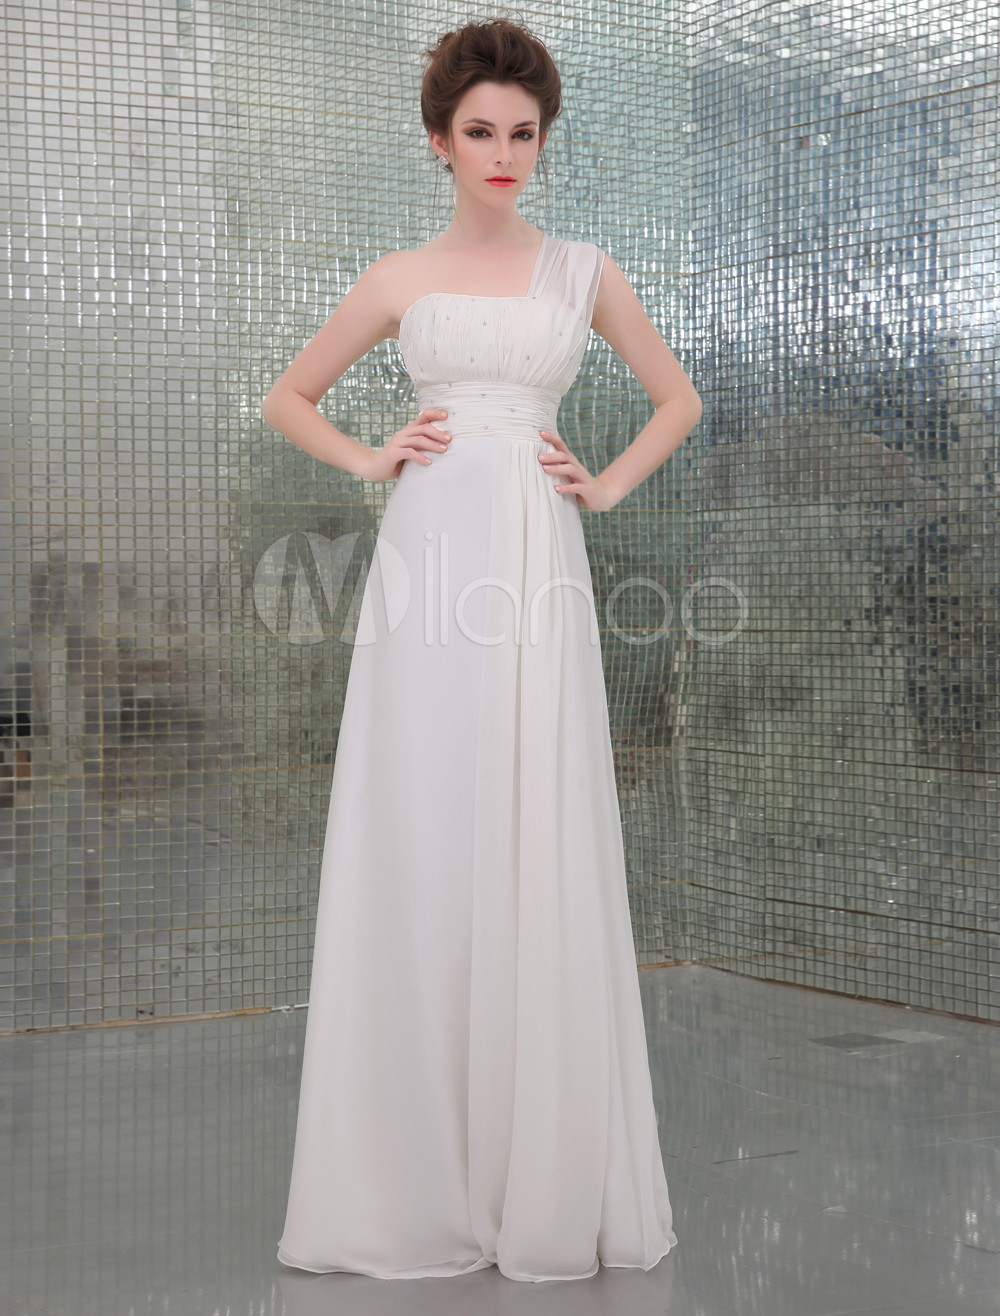 White One-Shoulder A-line Beading Chiffon Evening Dress (Wedding Evening Dresses) photo